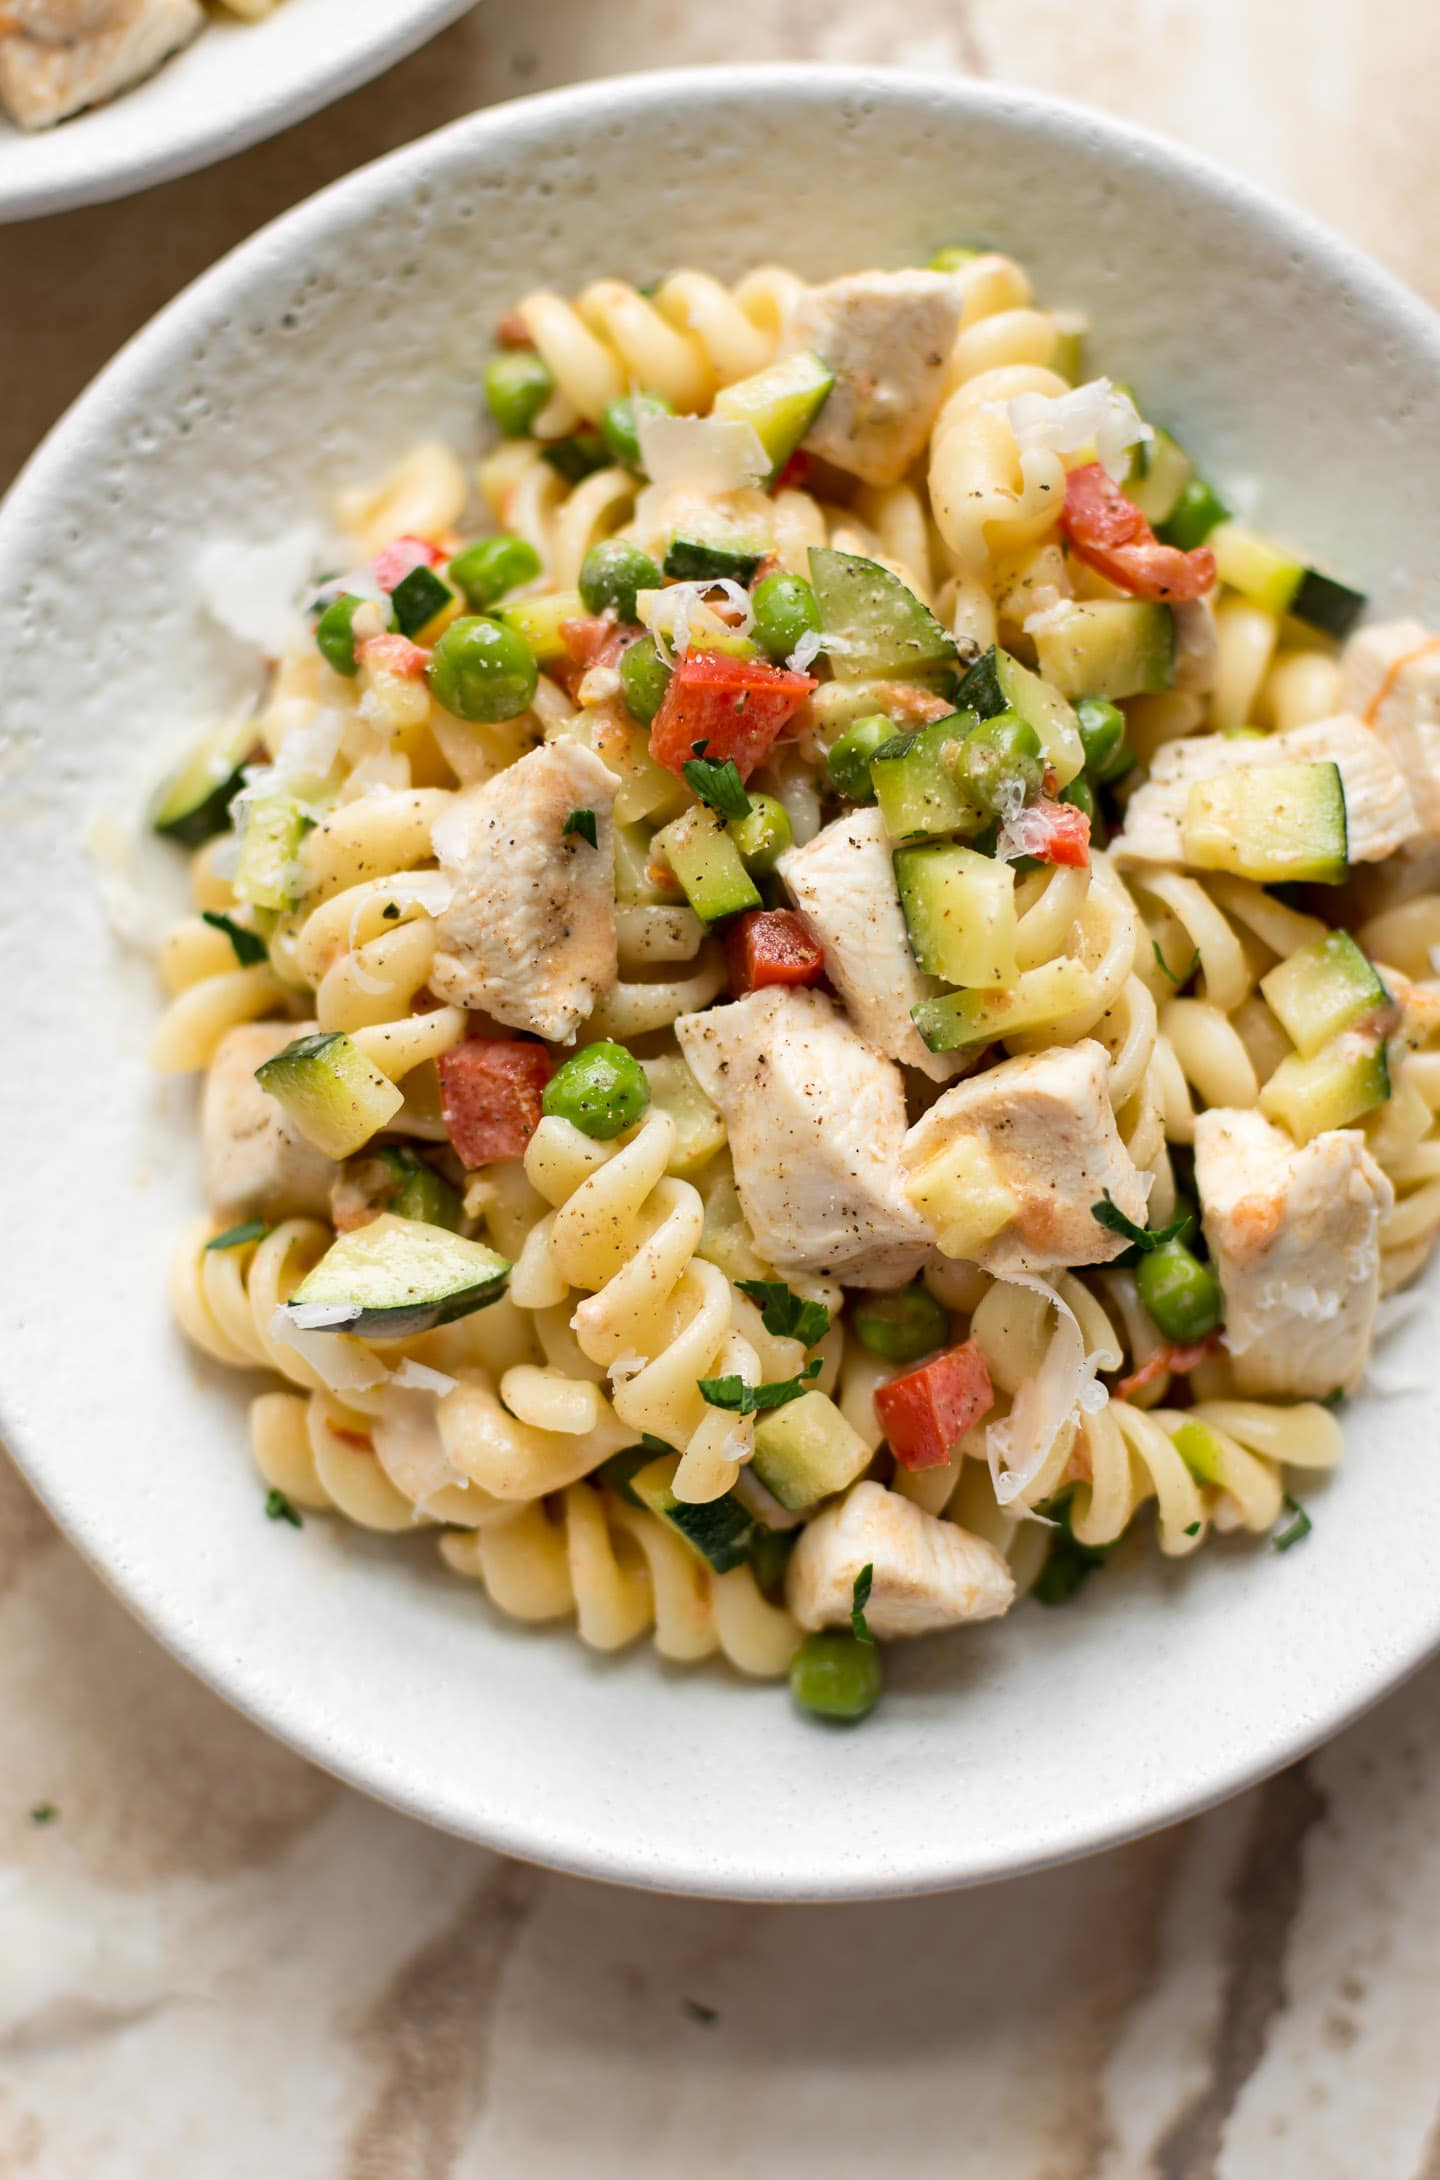 This creamy Pasta Primavera recipe with chicken is fresh, simple, and delicious.